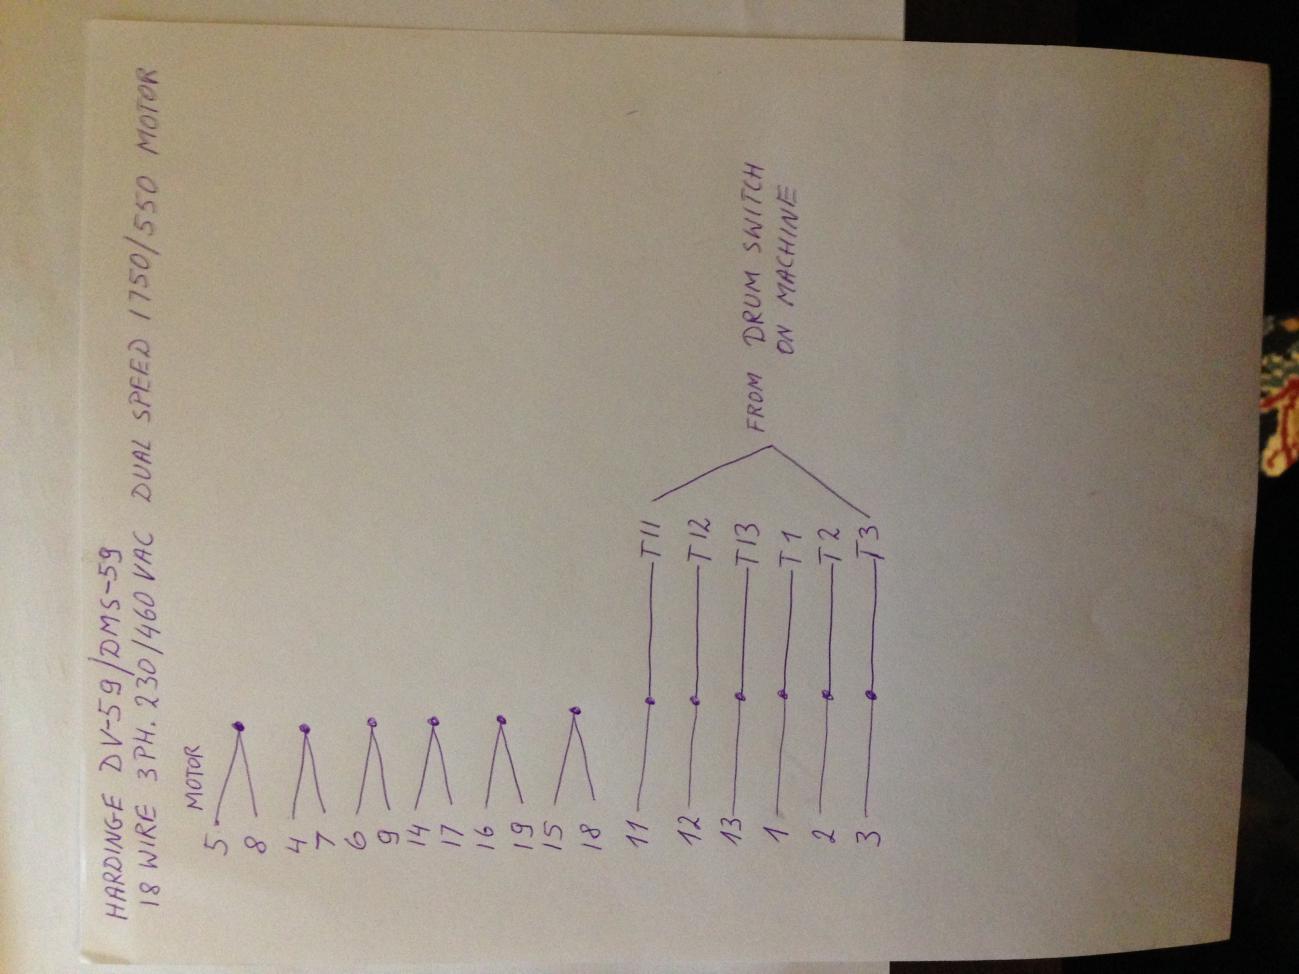 Speed Three Phase Motor Wiring Diagram On 5 Lead Motor Wiring Diagram